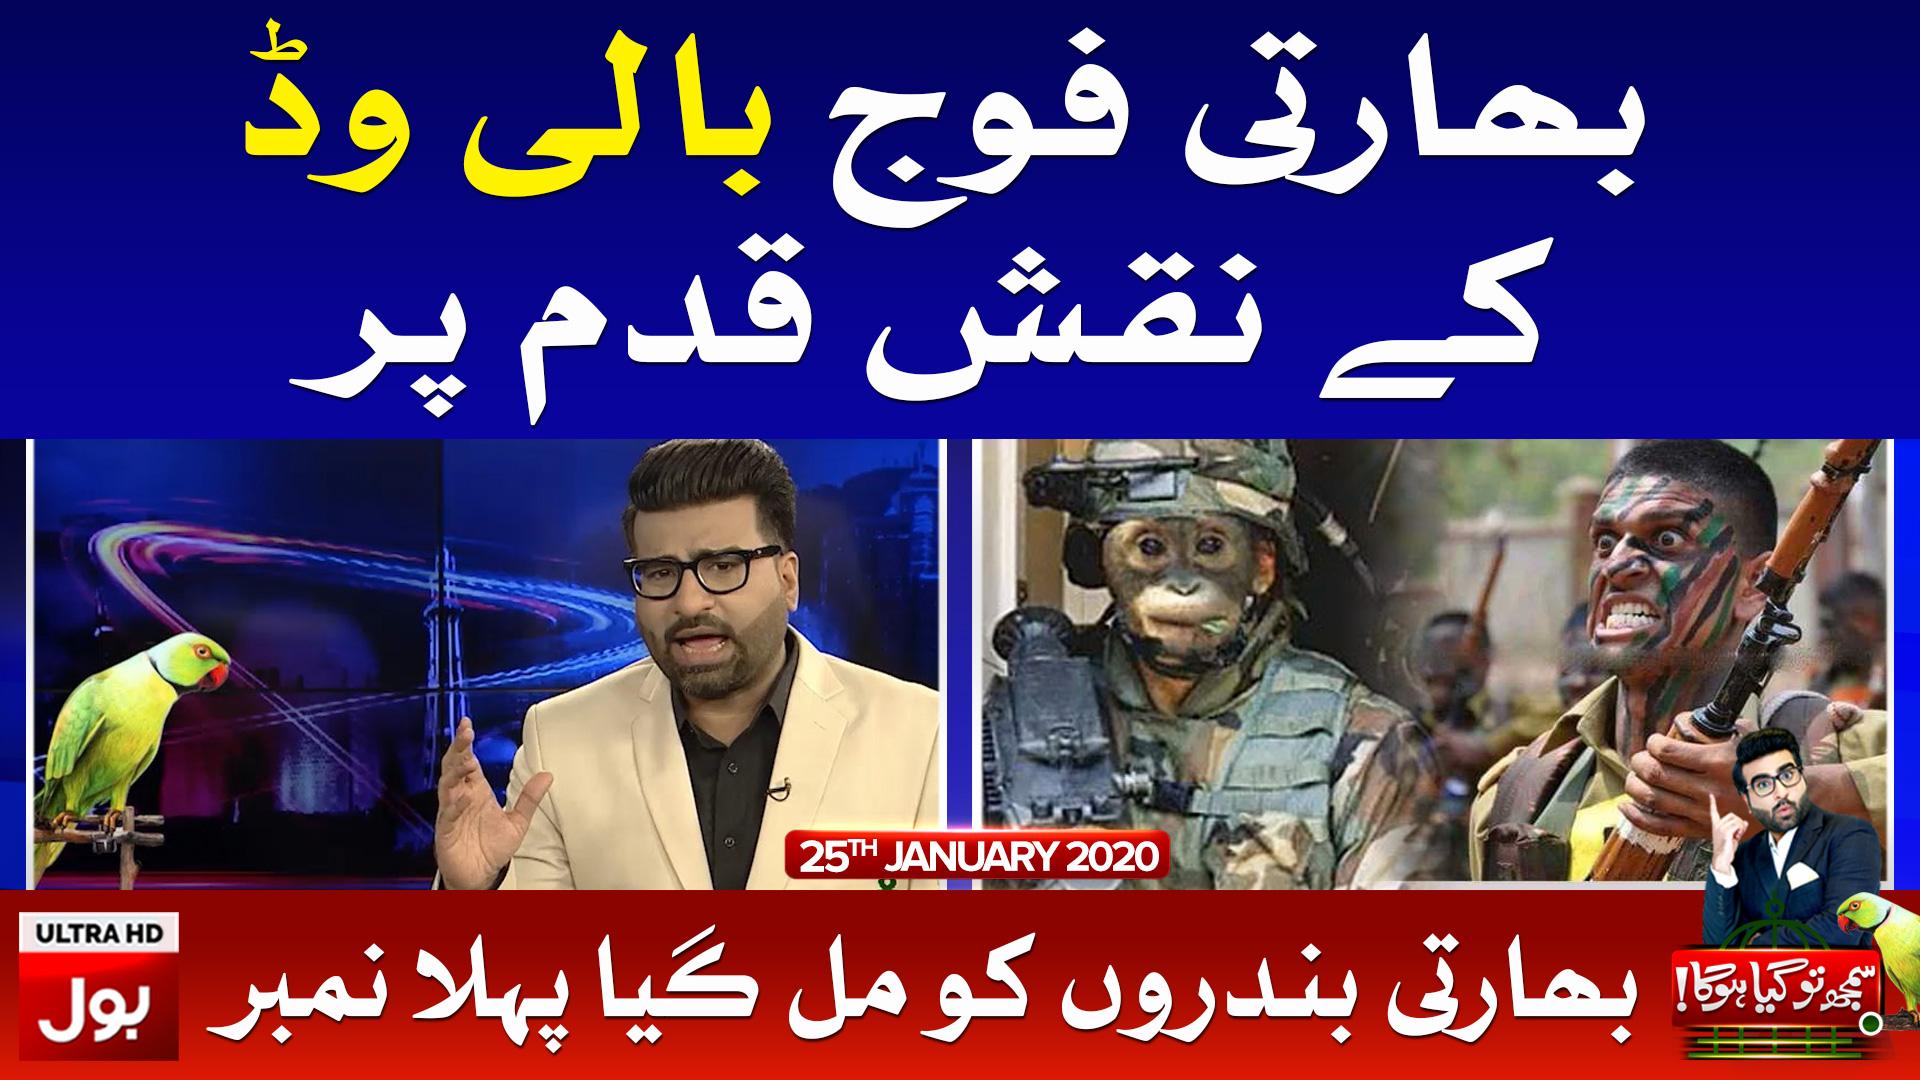 Samajh Tou Gaya Hoga Comedy Show Full Episode | 25th January 2020 | BOL News